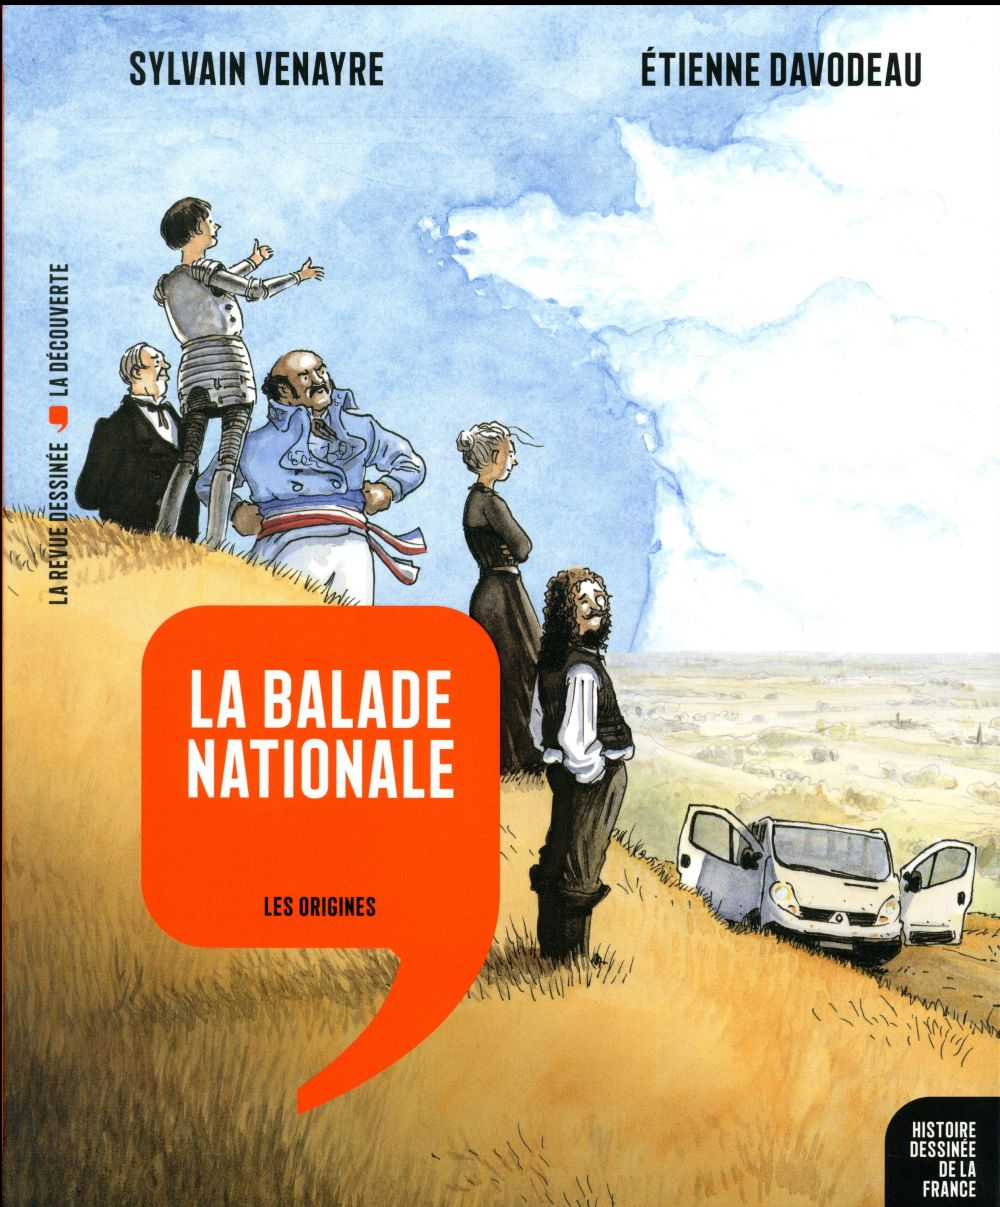 HISTOIRE DESSINEE DE LA FRANCE - 1 - LA BALADE NATIONALE - LES ORIGINES Venayre Sylvain Revue dessinée